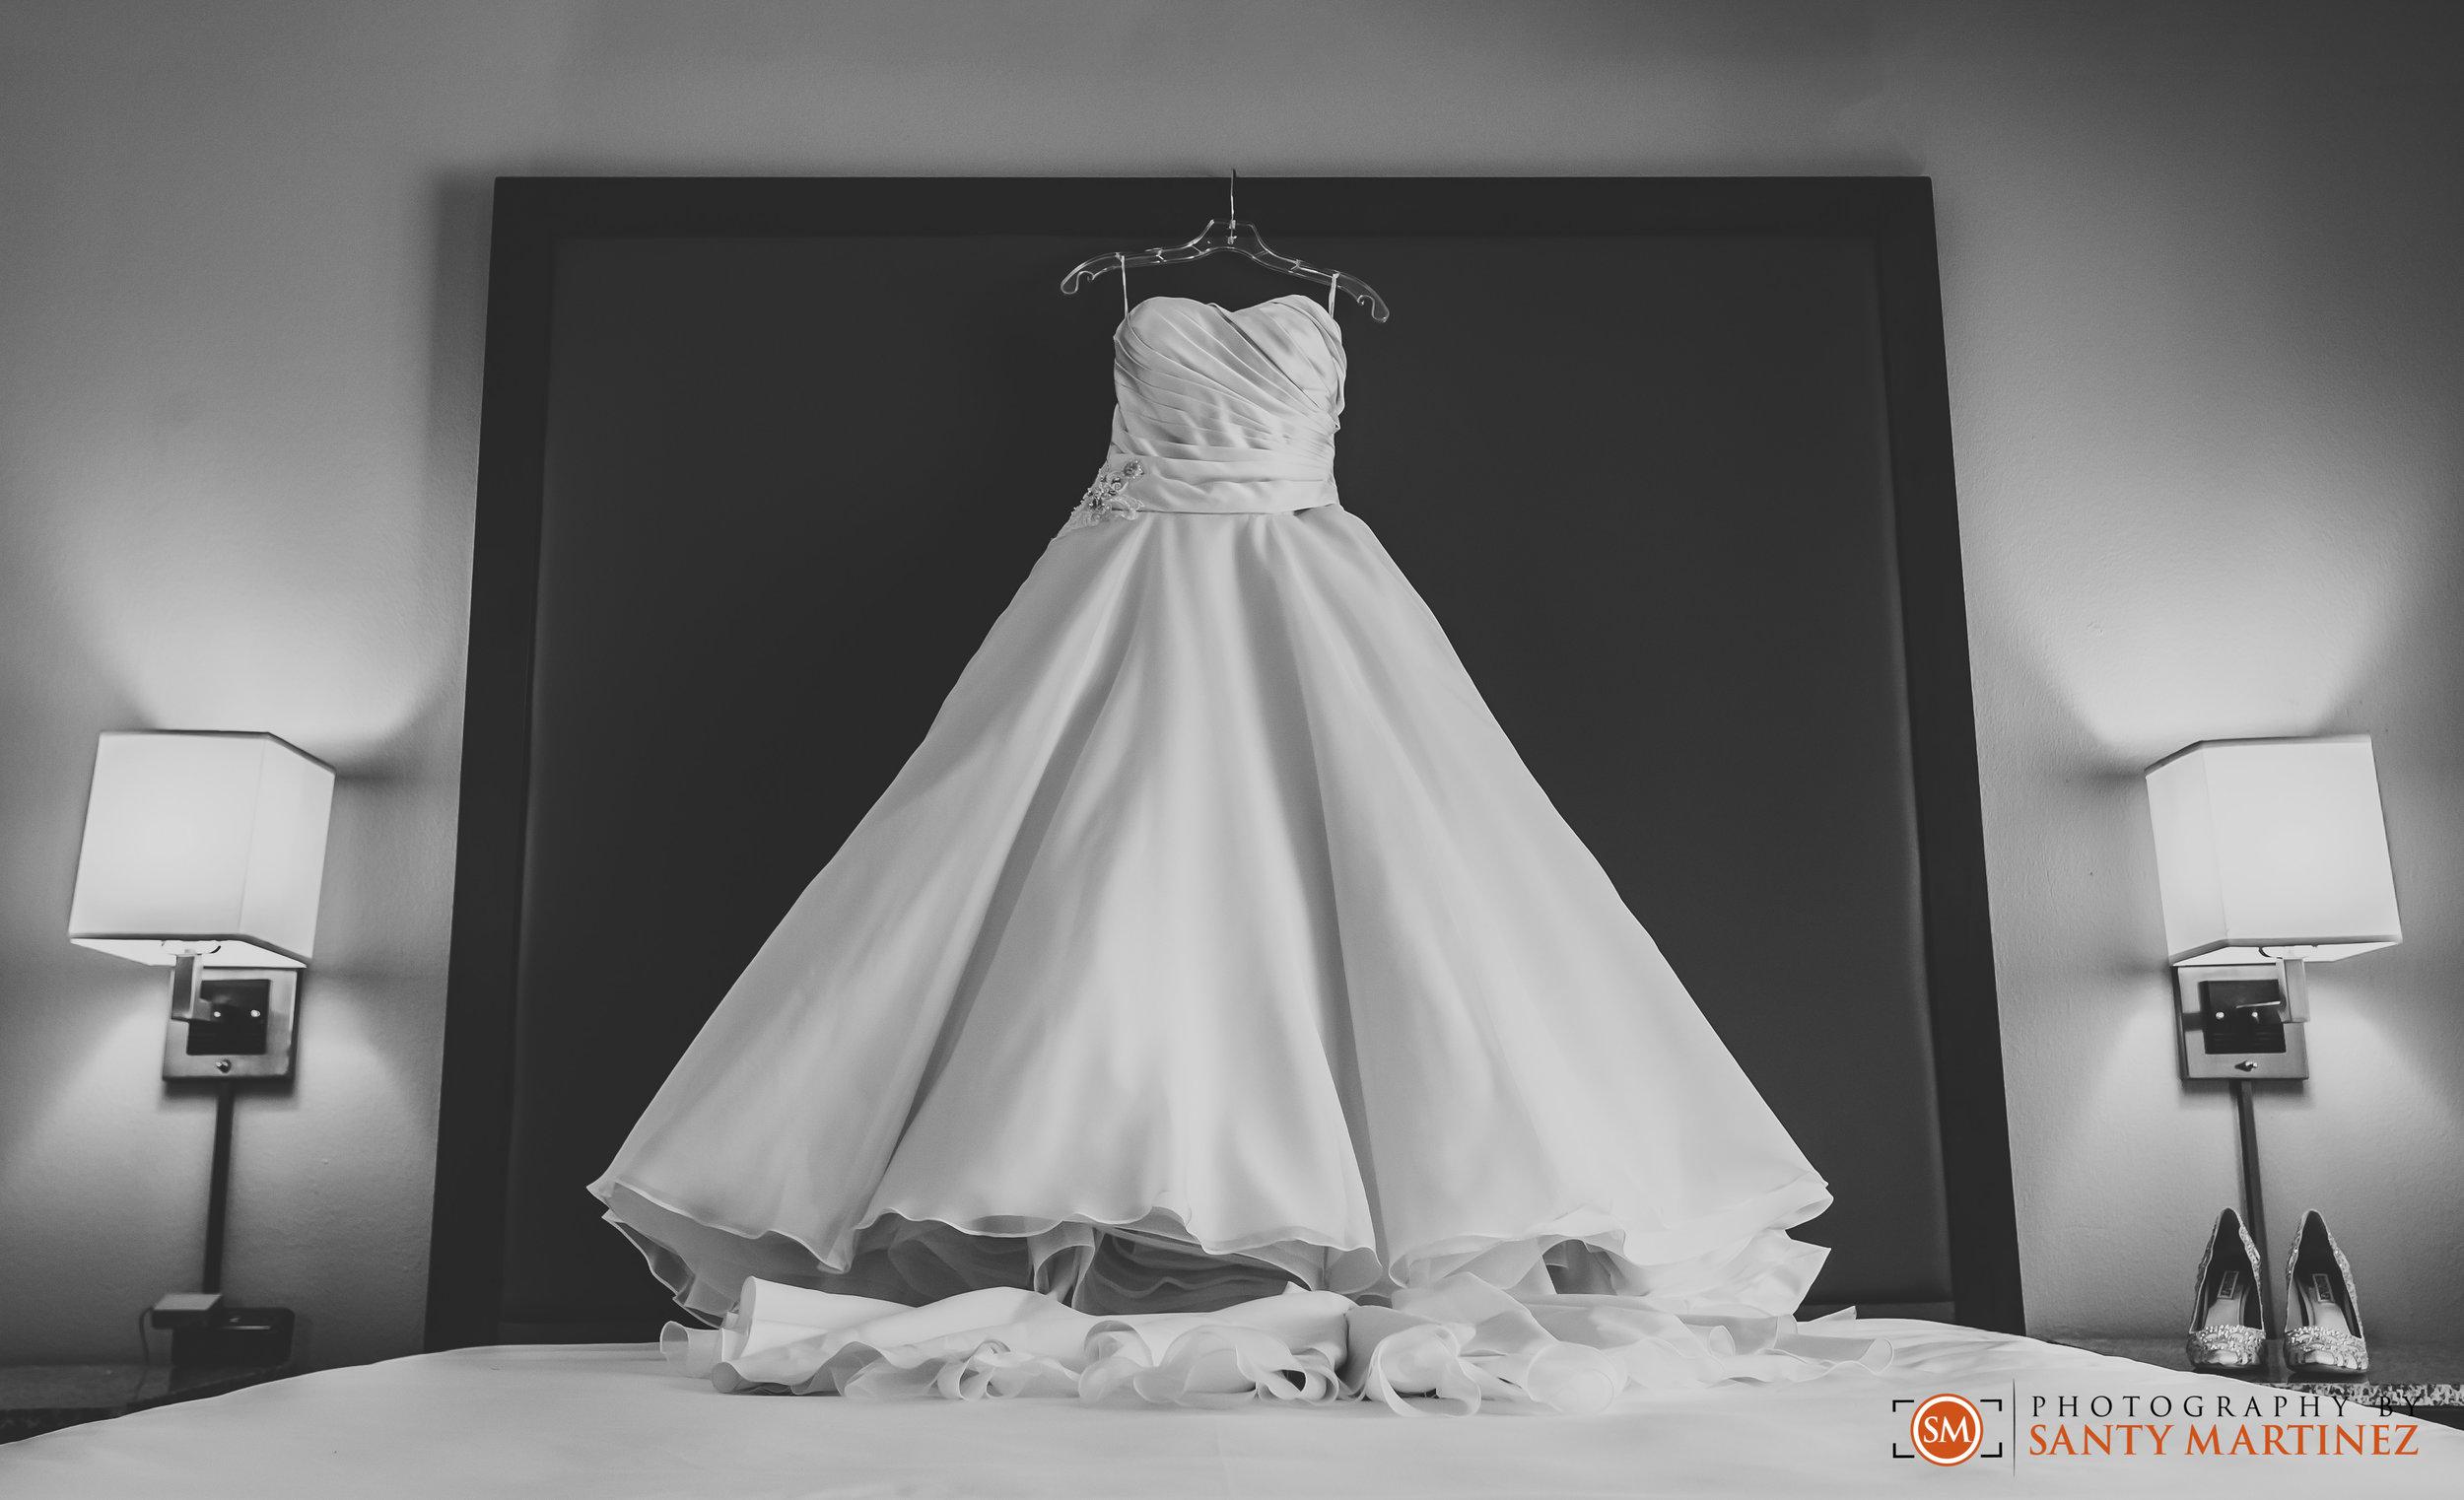 Wedding First Miami Presbyterian Church - Photography by Santy Martinez-1.jpg